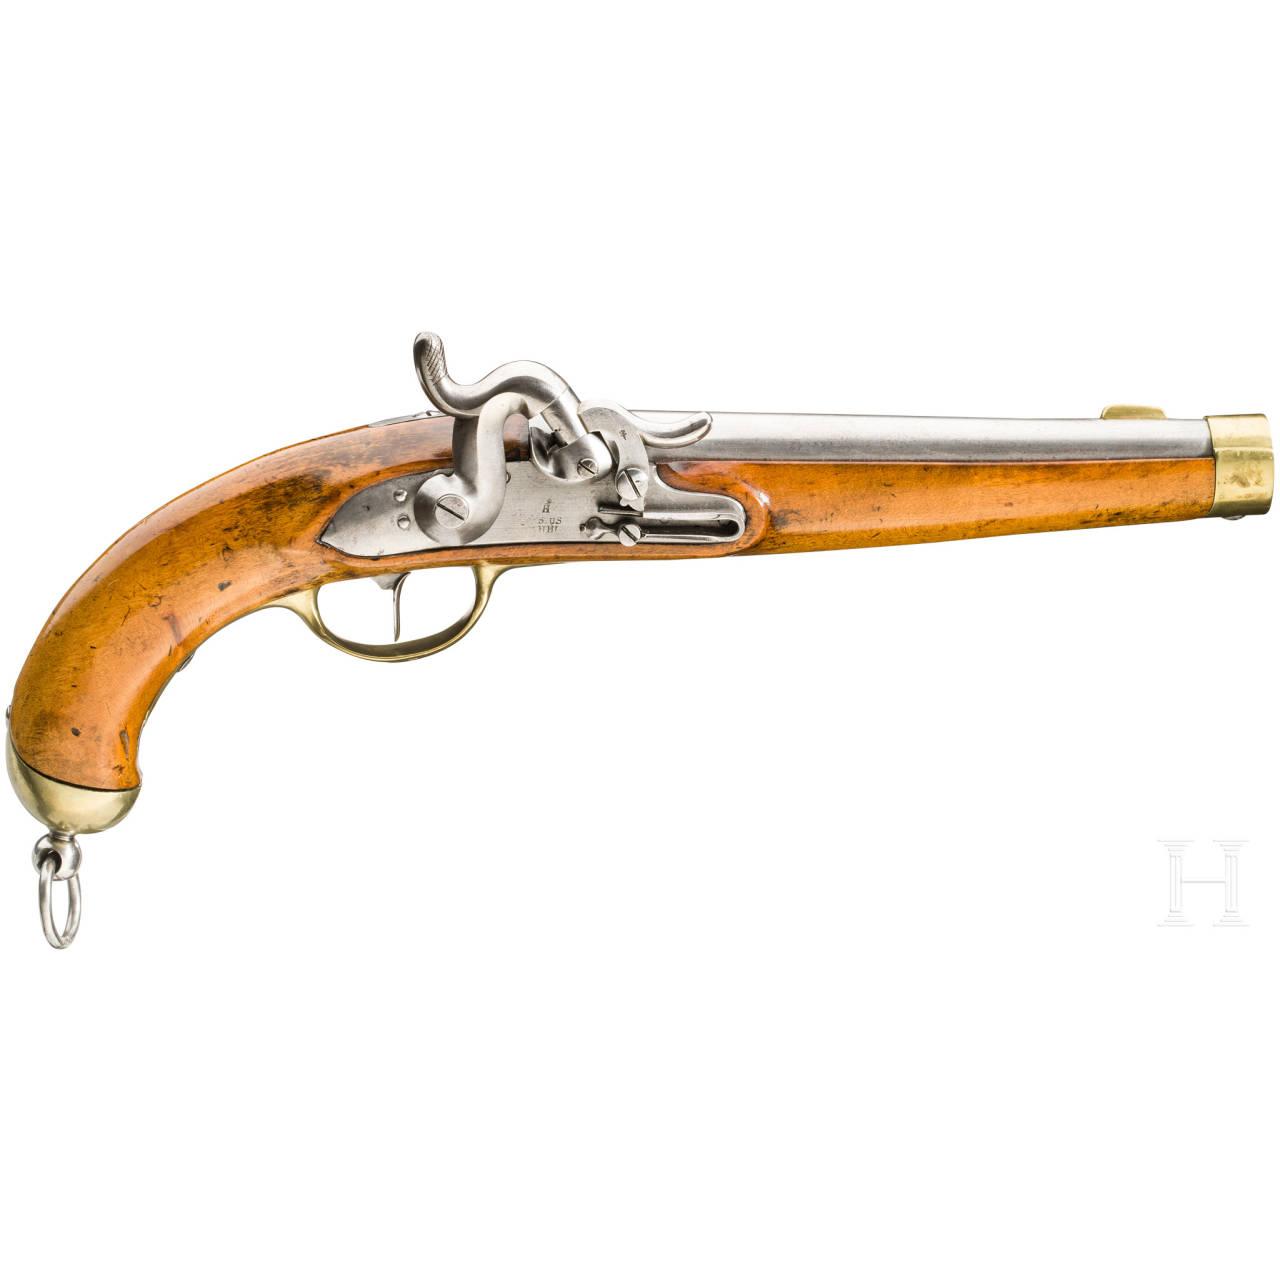 Kavalleriepistole M 1823/50